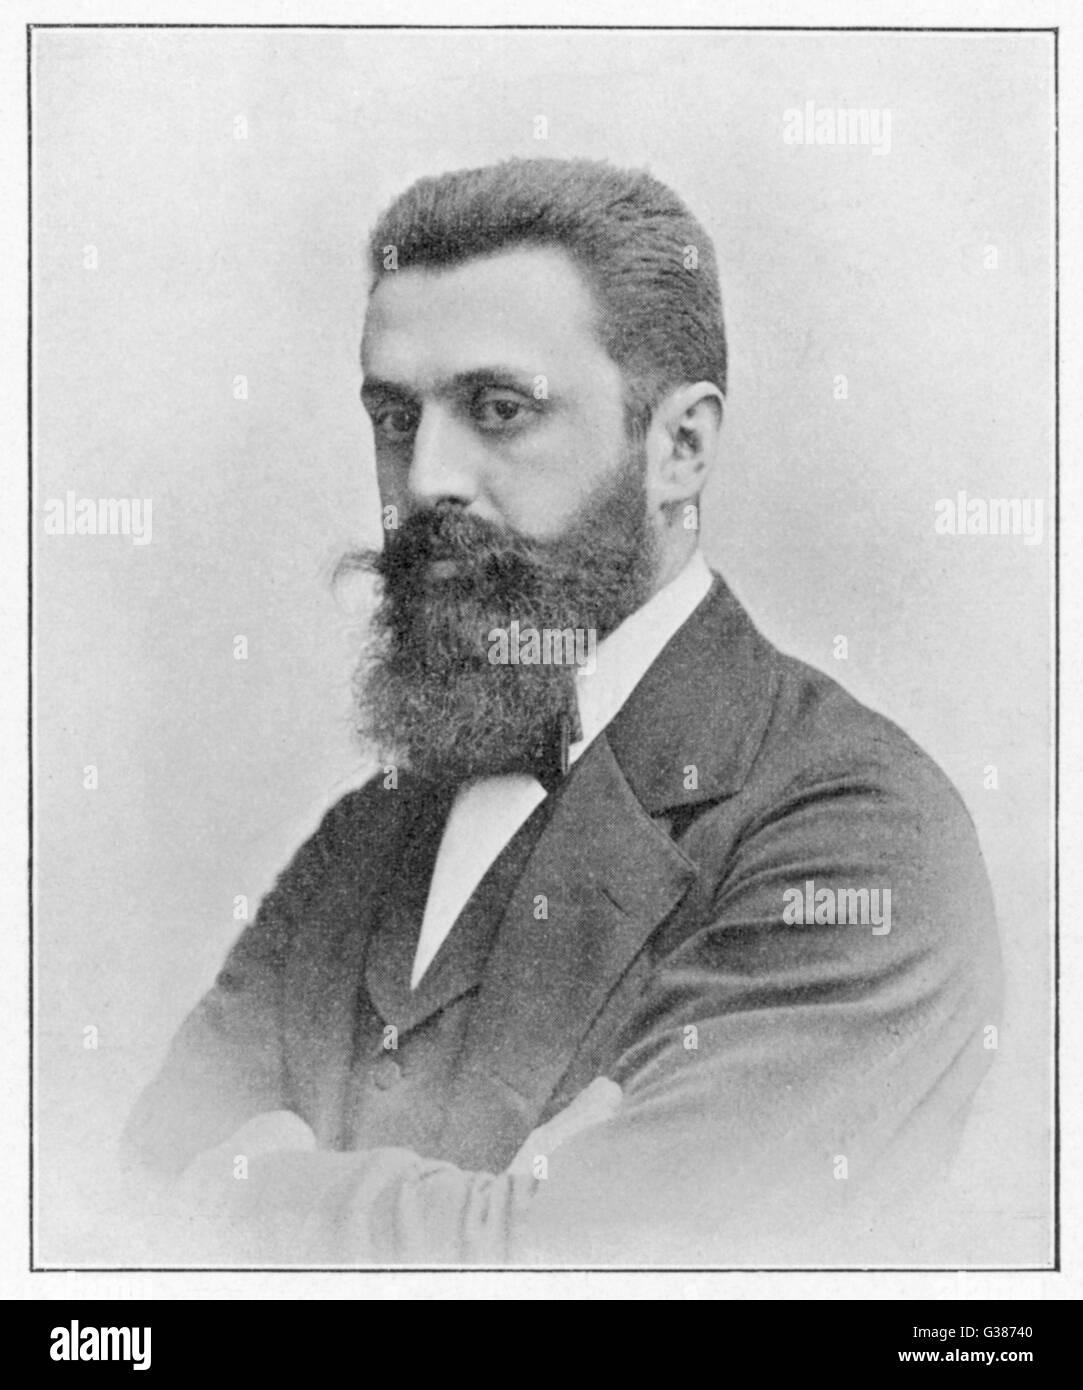 THEODOR HERZL  Hungarian Zionist leader        Date: 1860 - 1904 - Stock Image